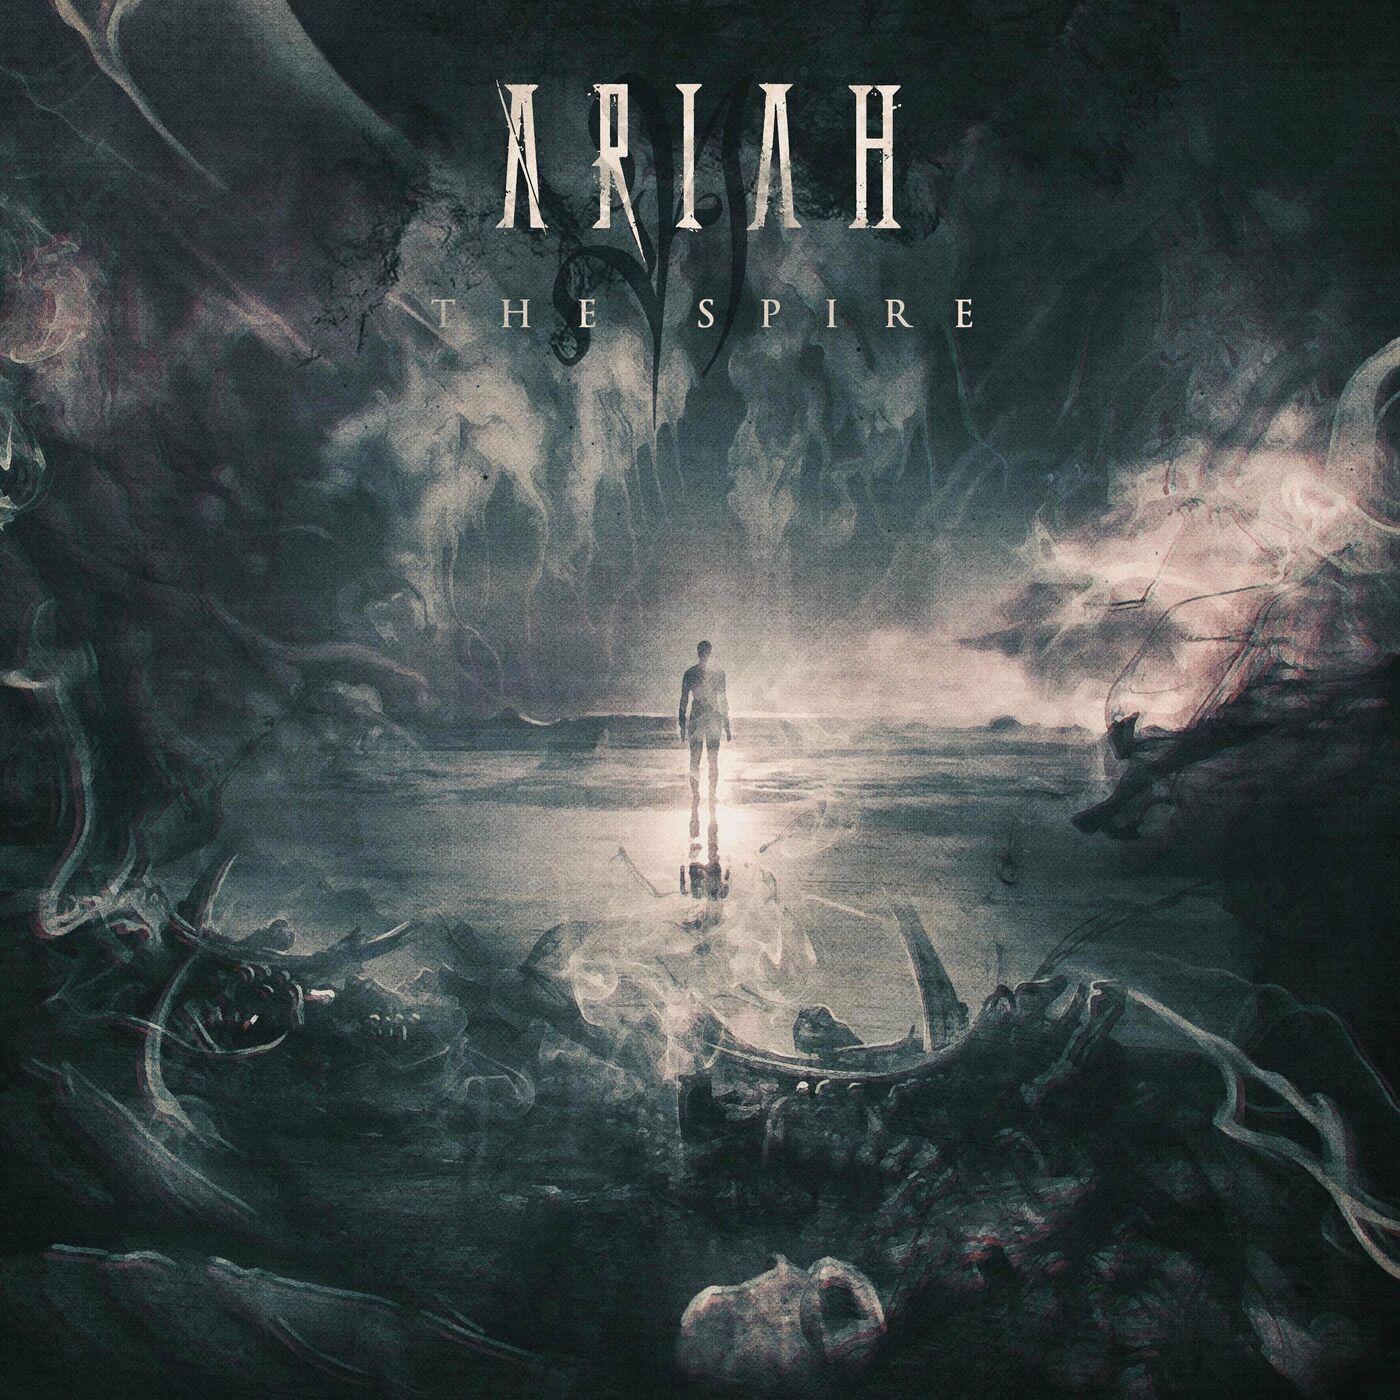 Ariah - The Spire (2020)